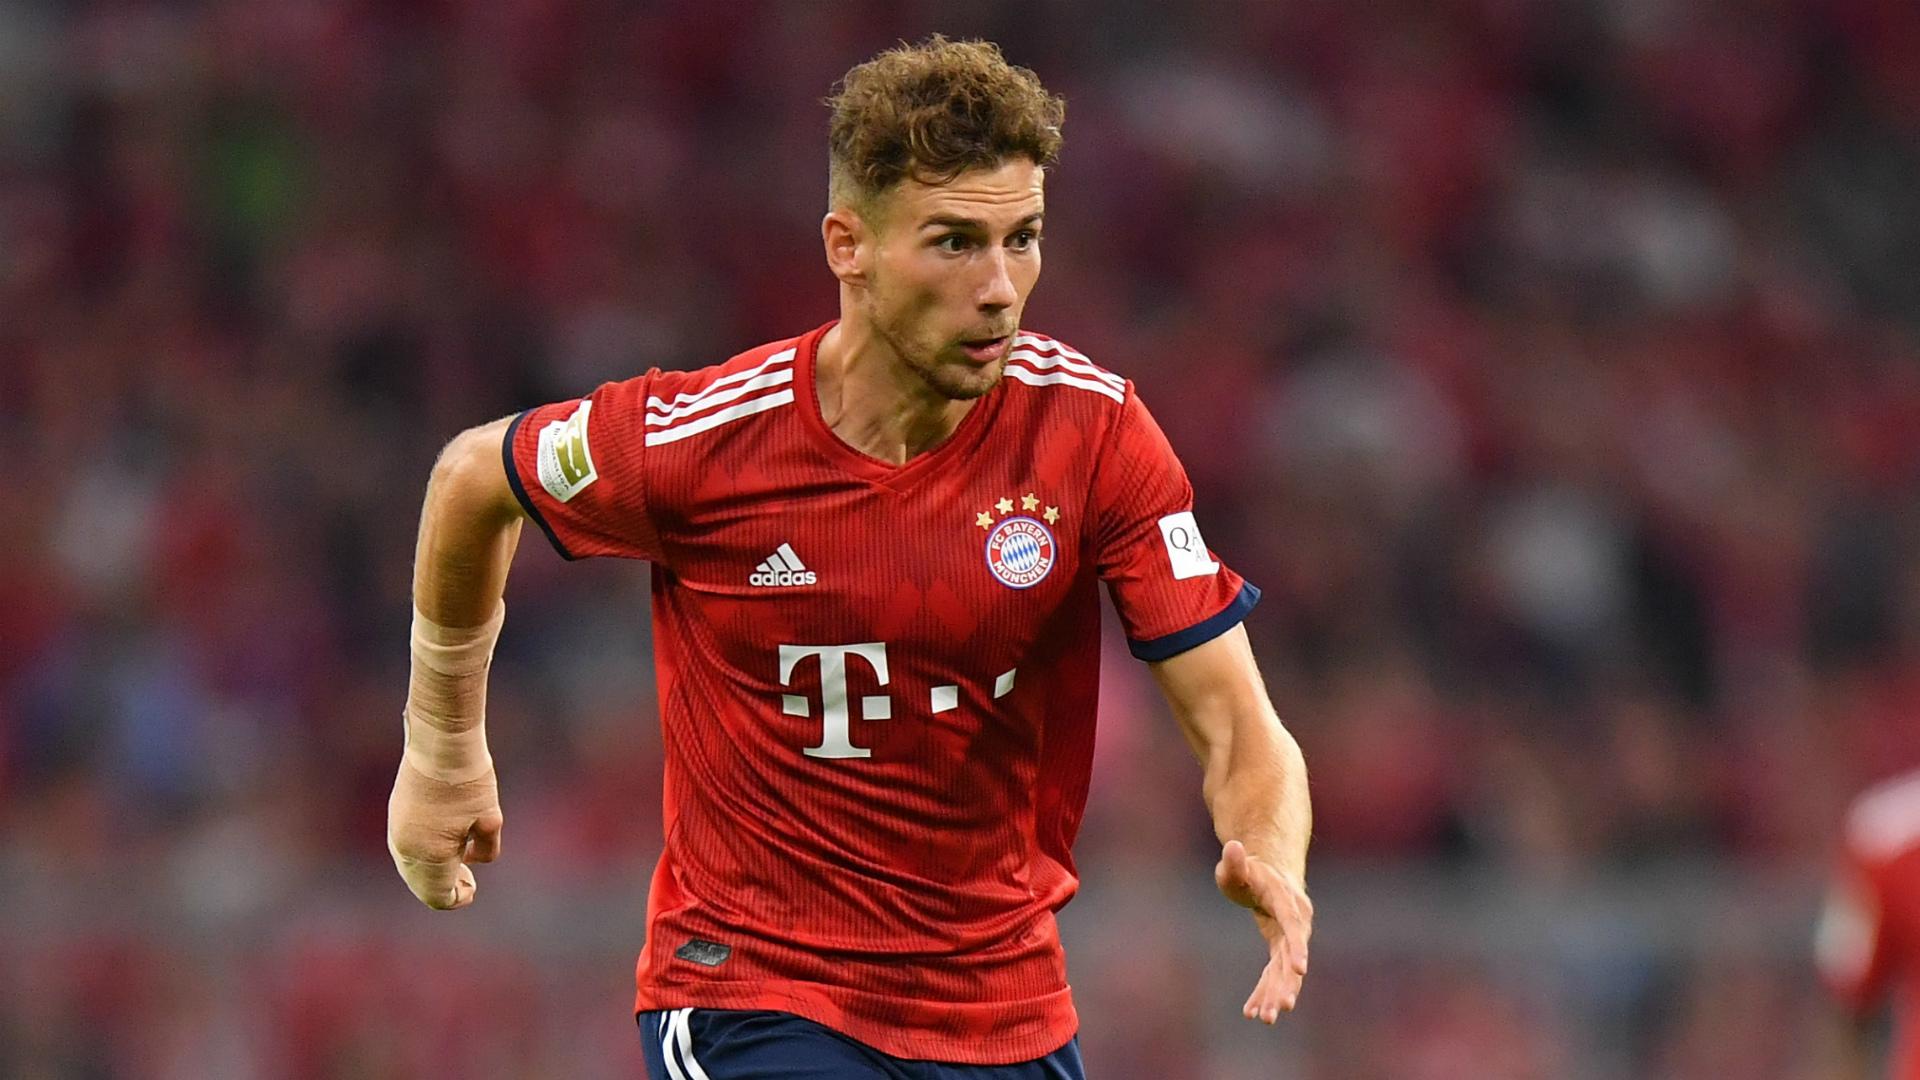 super popular 5741d dada7 Leon Goretzka earns praise from Bayern boss Niko Kovac after ...